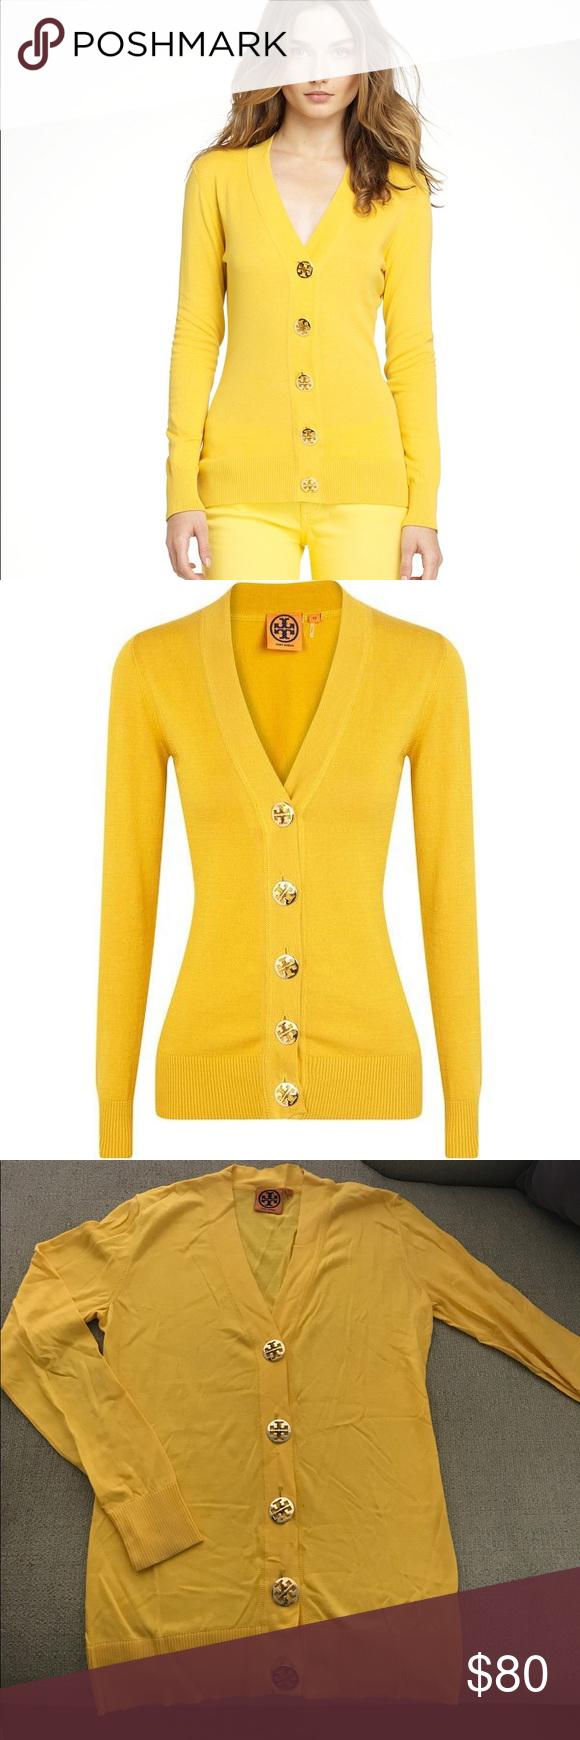 5a59c1349bcf Tory Burch yellow gold Simone logo Cardigan Small Gorgeous Simone cotton  gold button logo sweater in